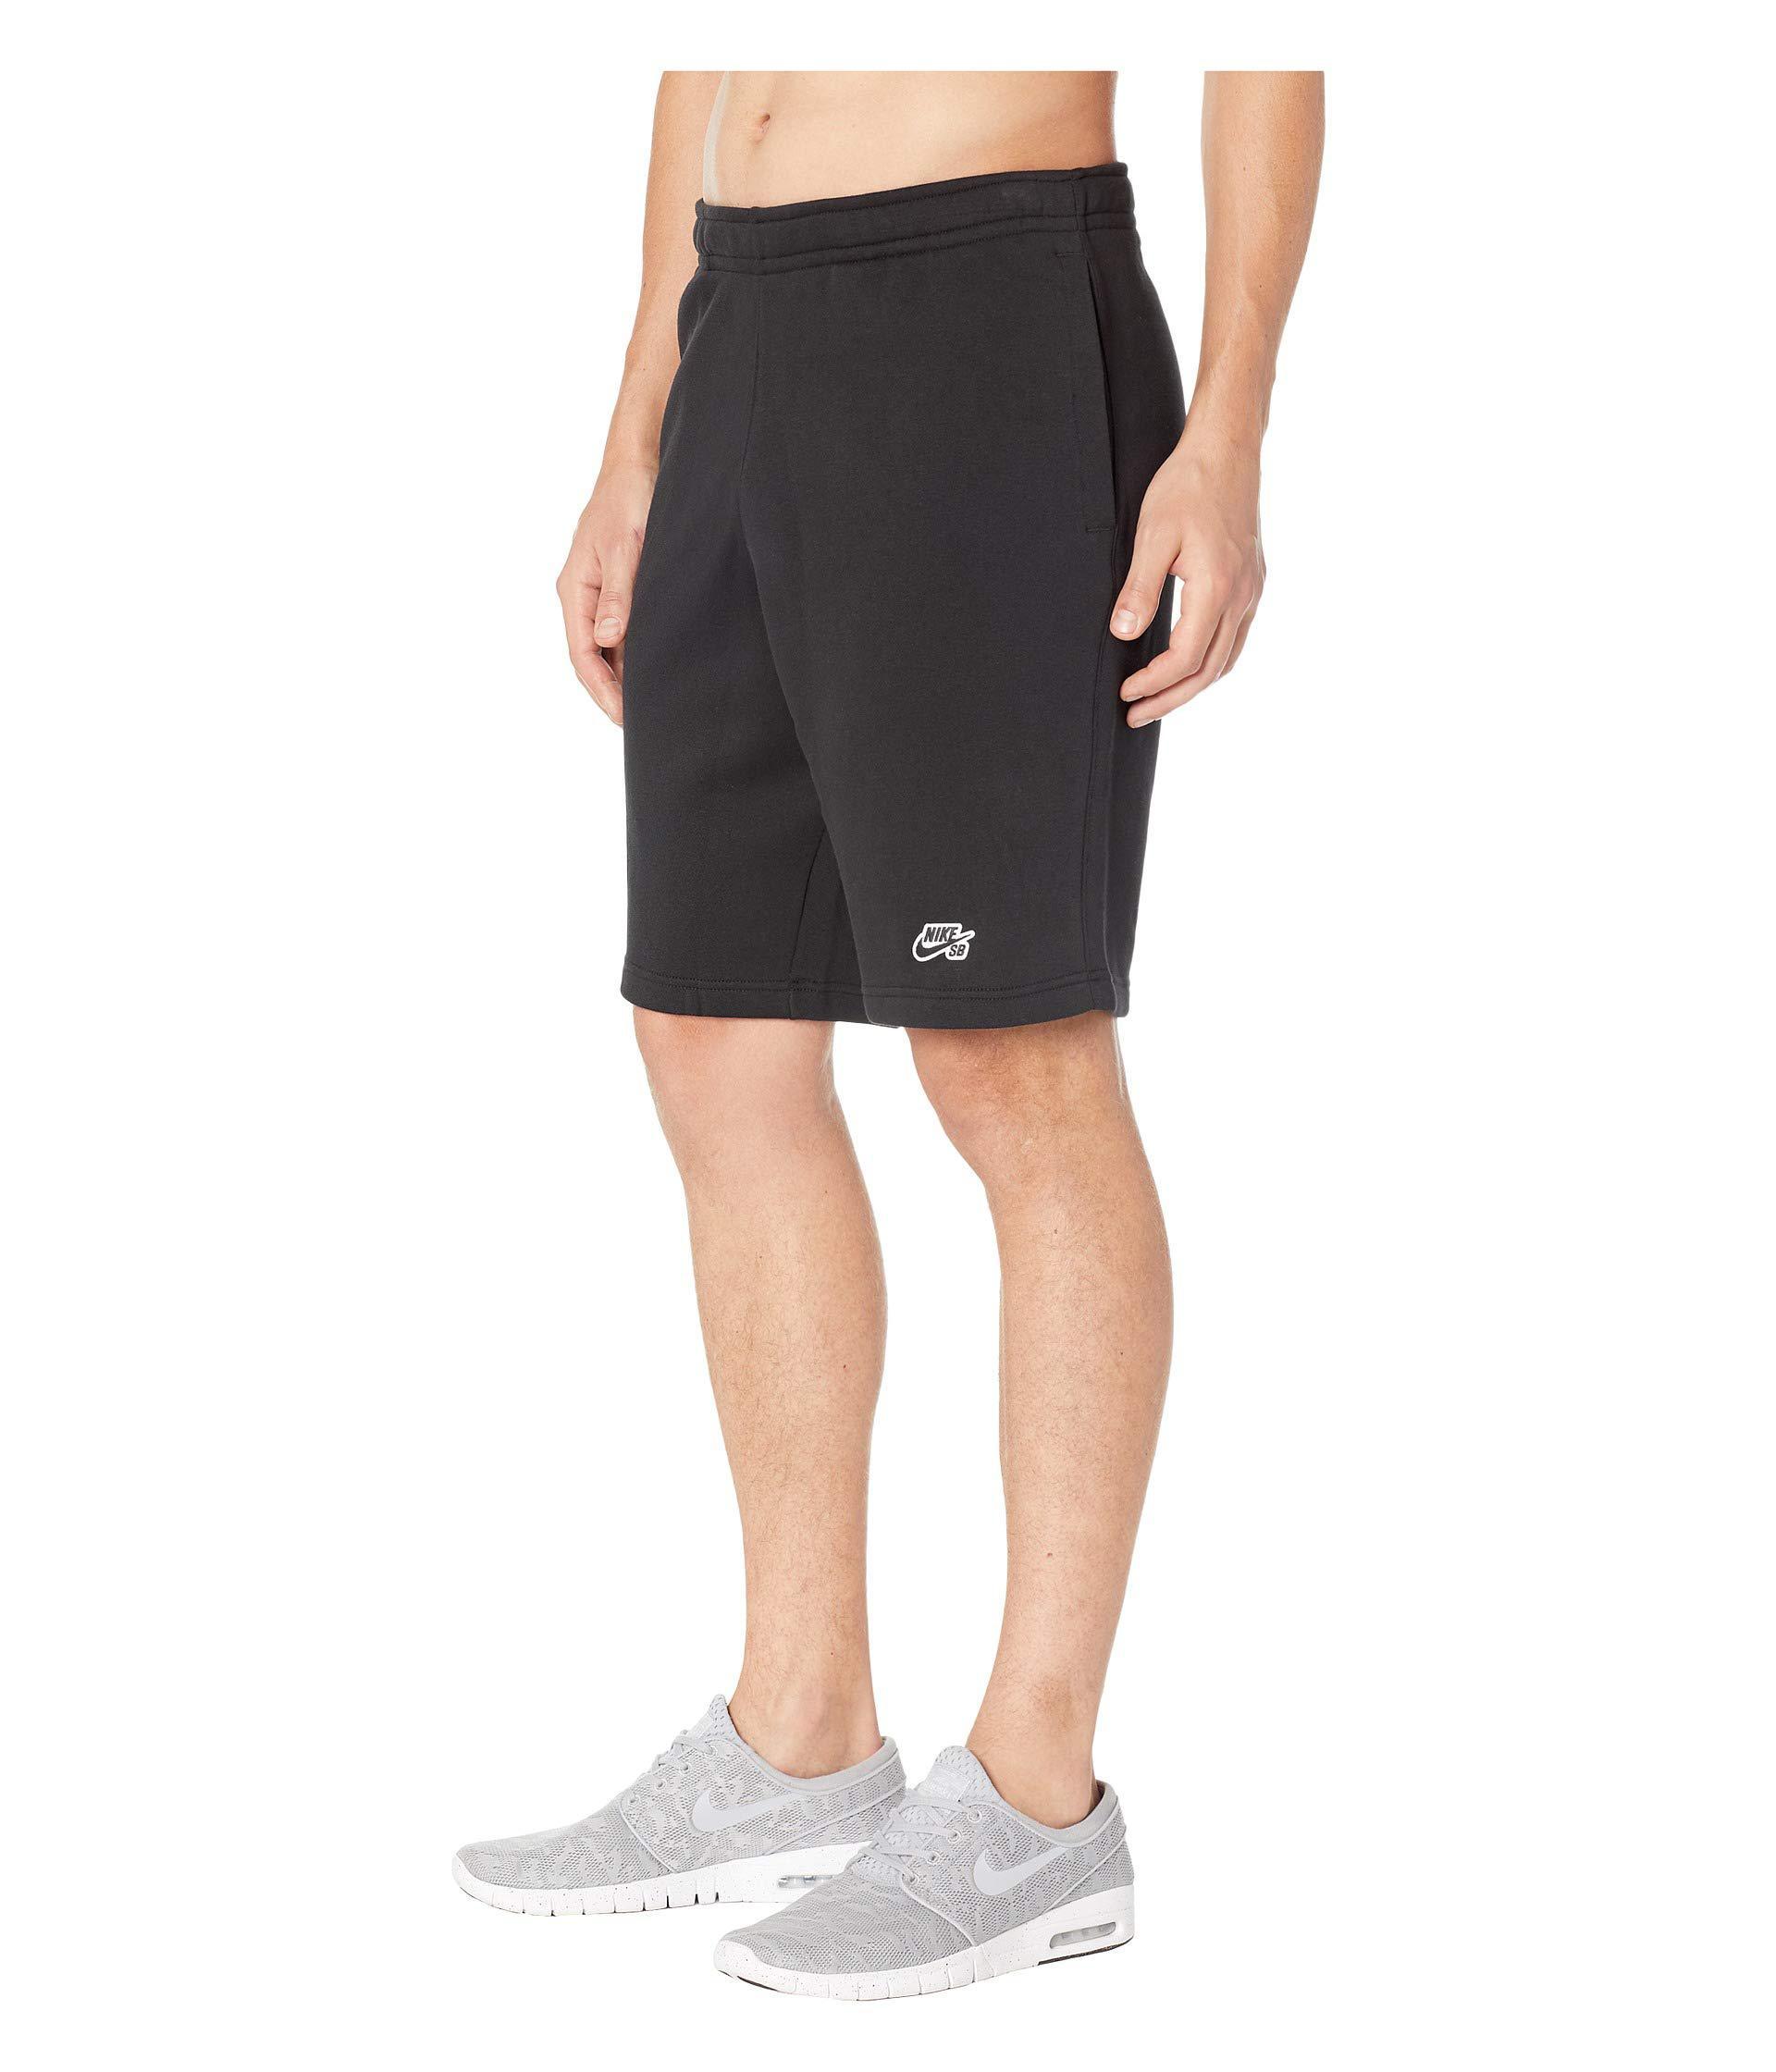 e84e3fdab49a Lyst - Nike Sb Icon Fleece Shorts in Black for Men